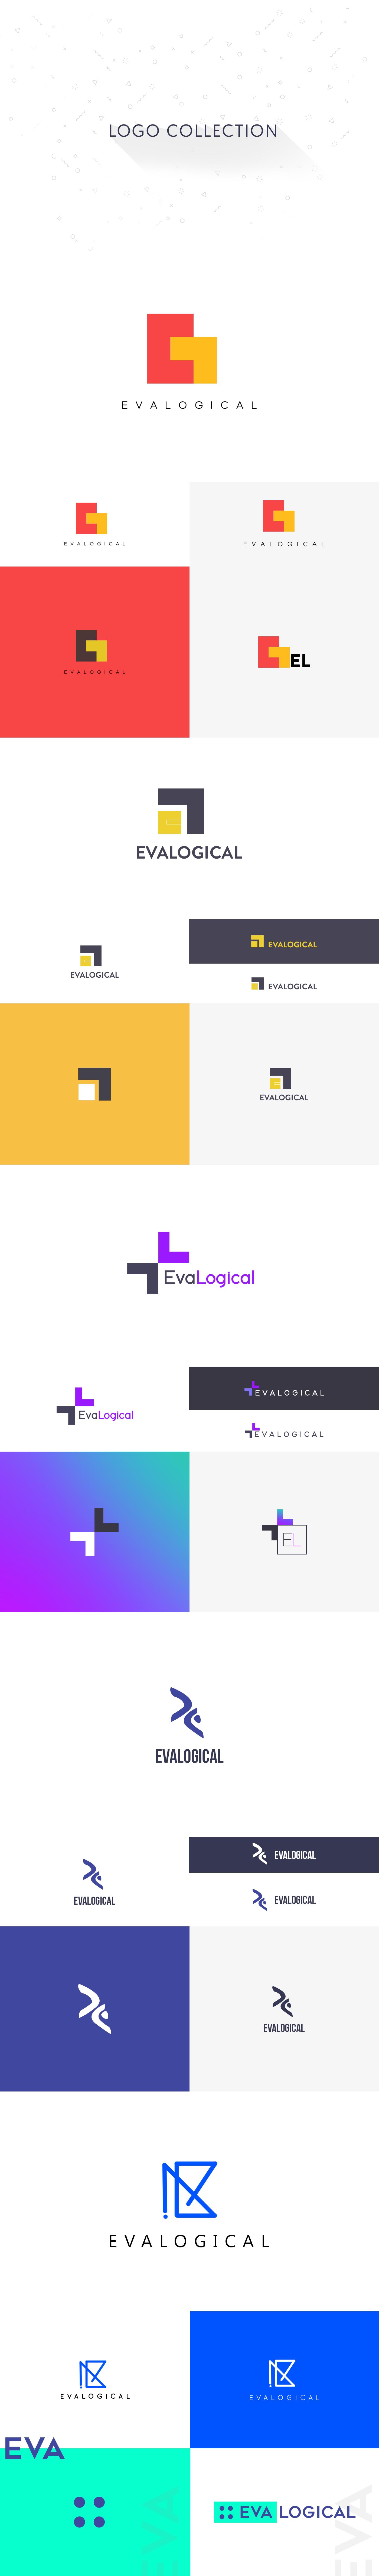 logo evalogical logodesign UI ux flat logo Design Concepts design studio trending design enterprise